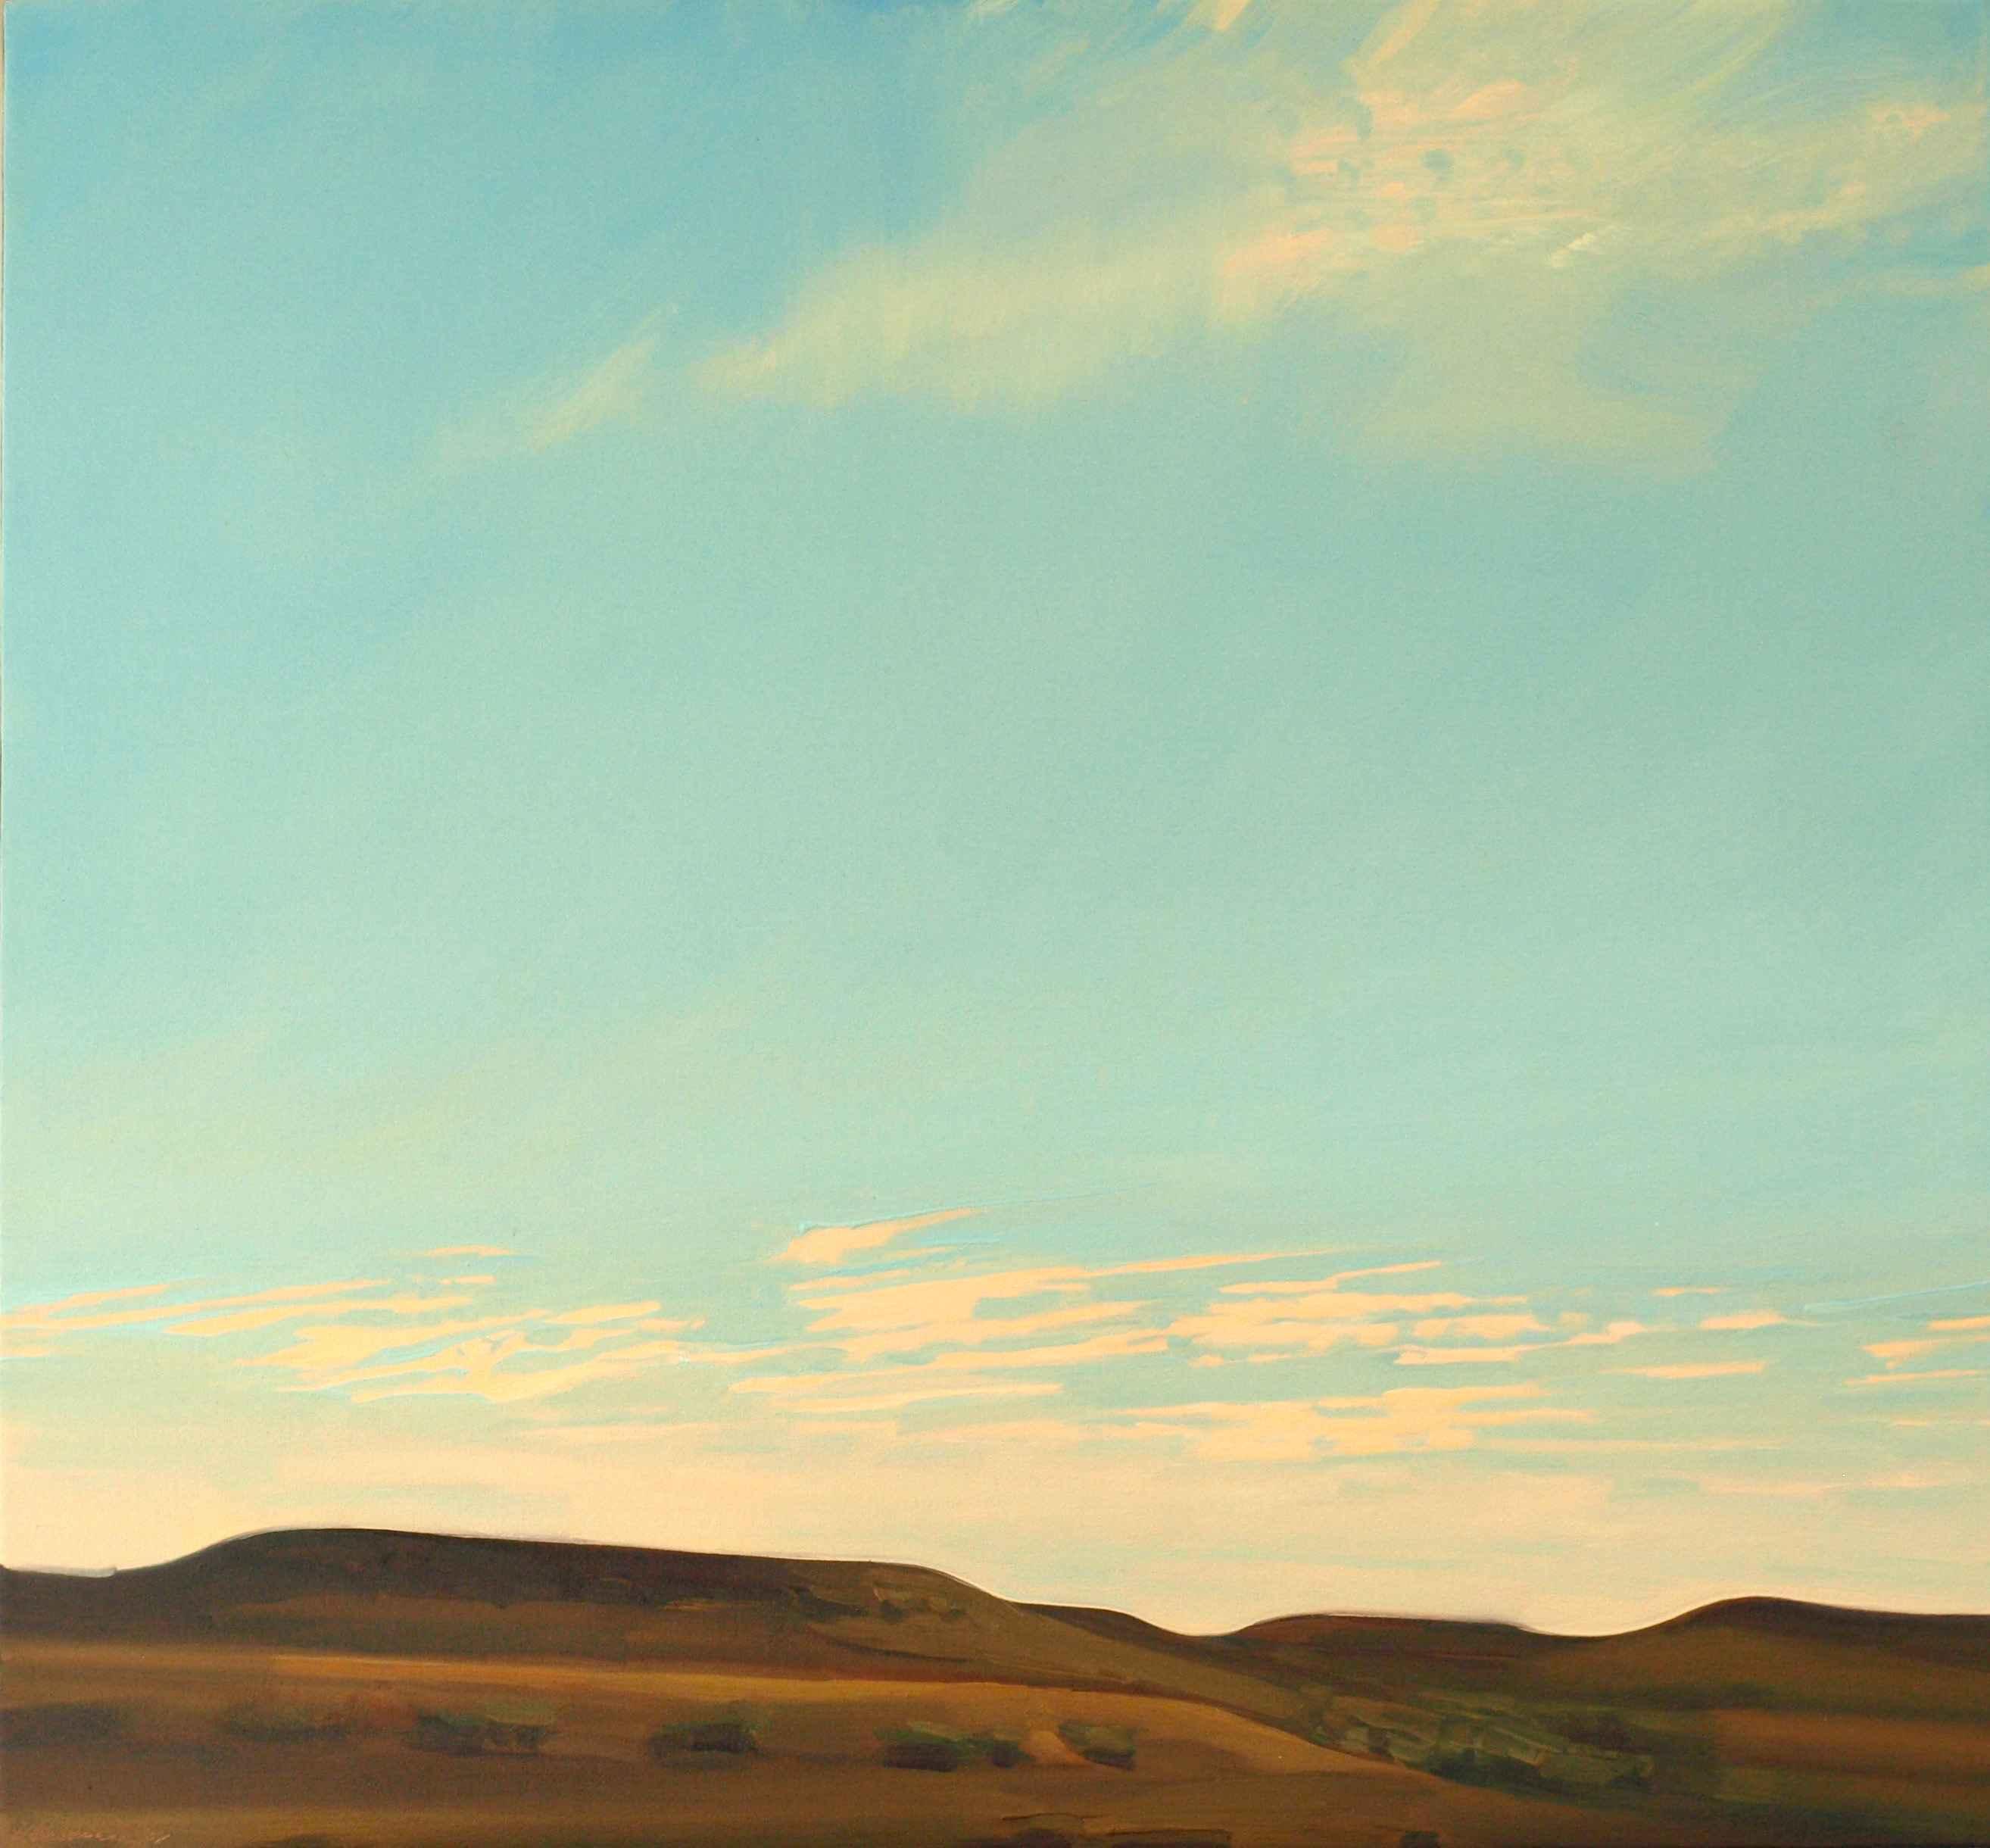 Konza - October Clouds by  Lisa Grossman - Masterpiece Online